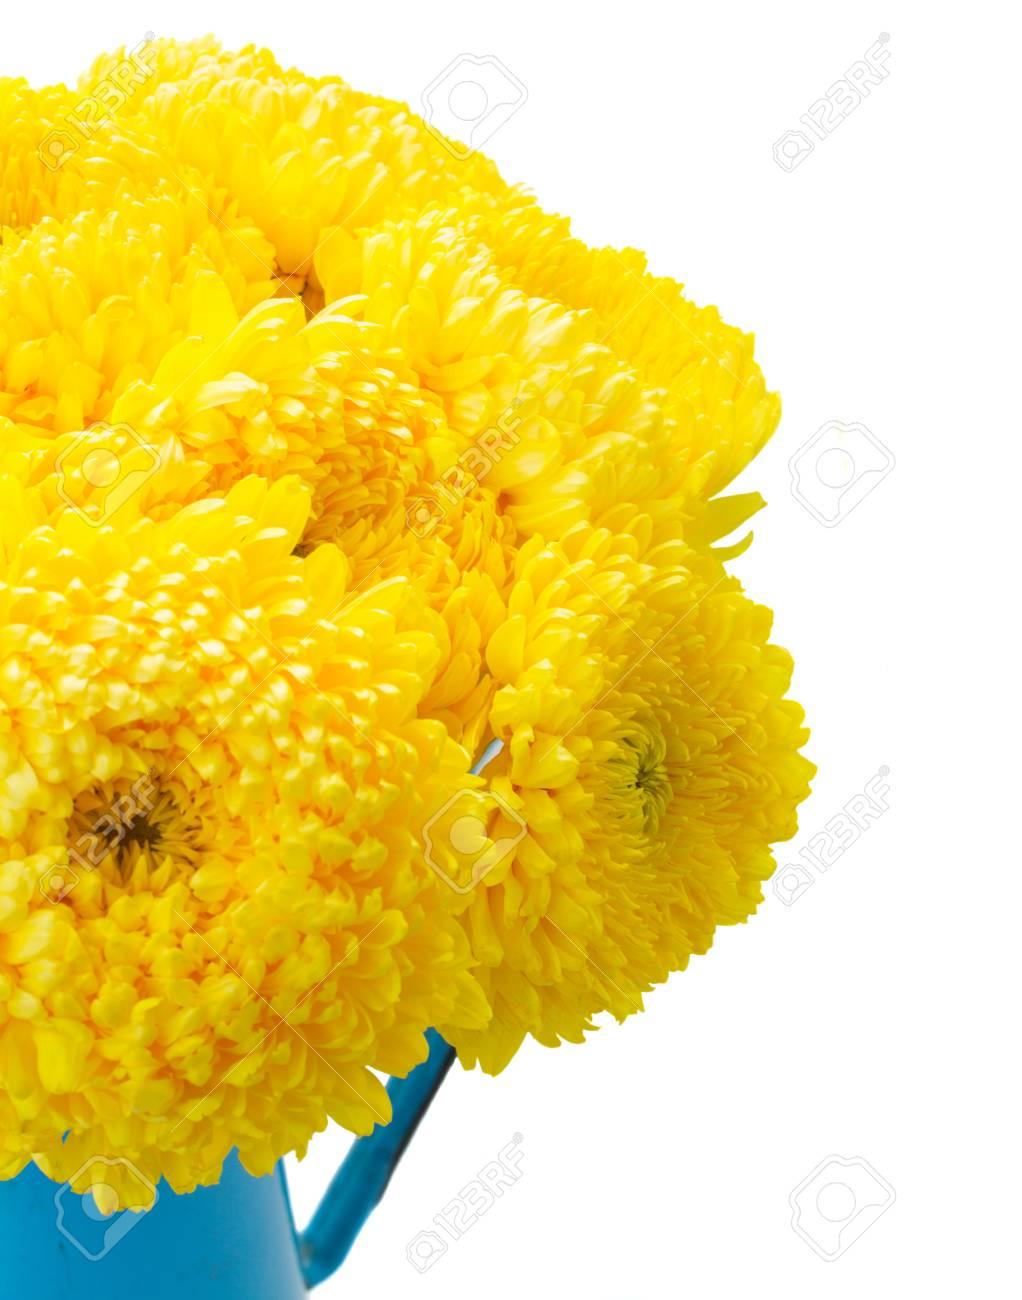 Posy Of Yellow Mum Flowers Close Up Isolated On White Background